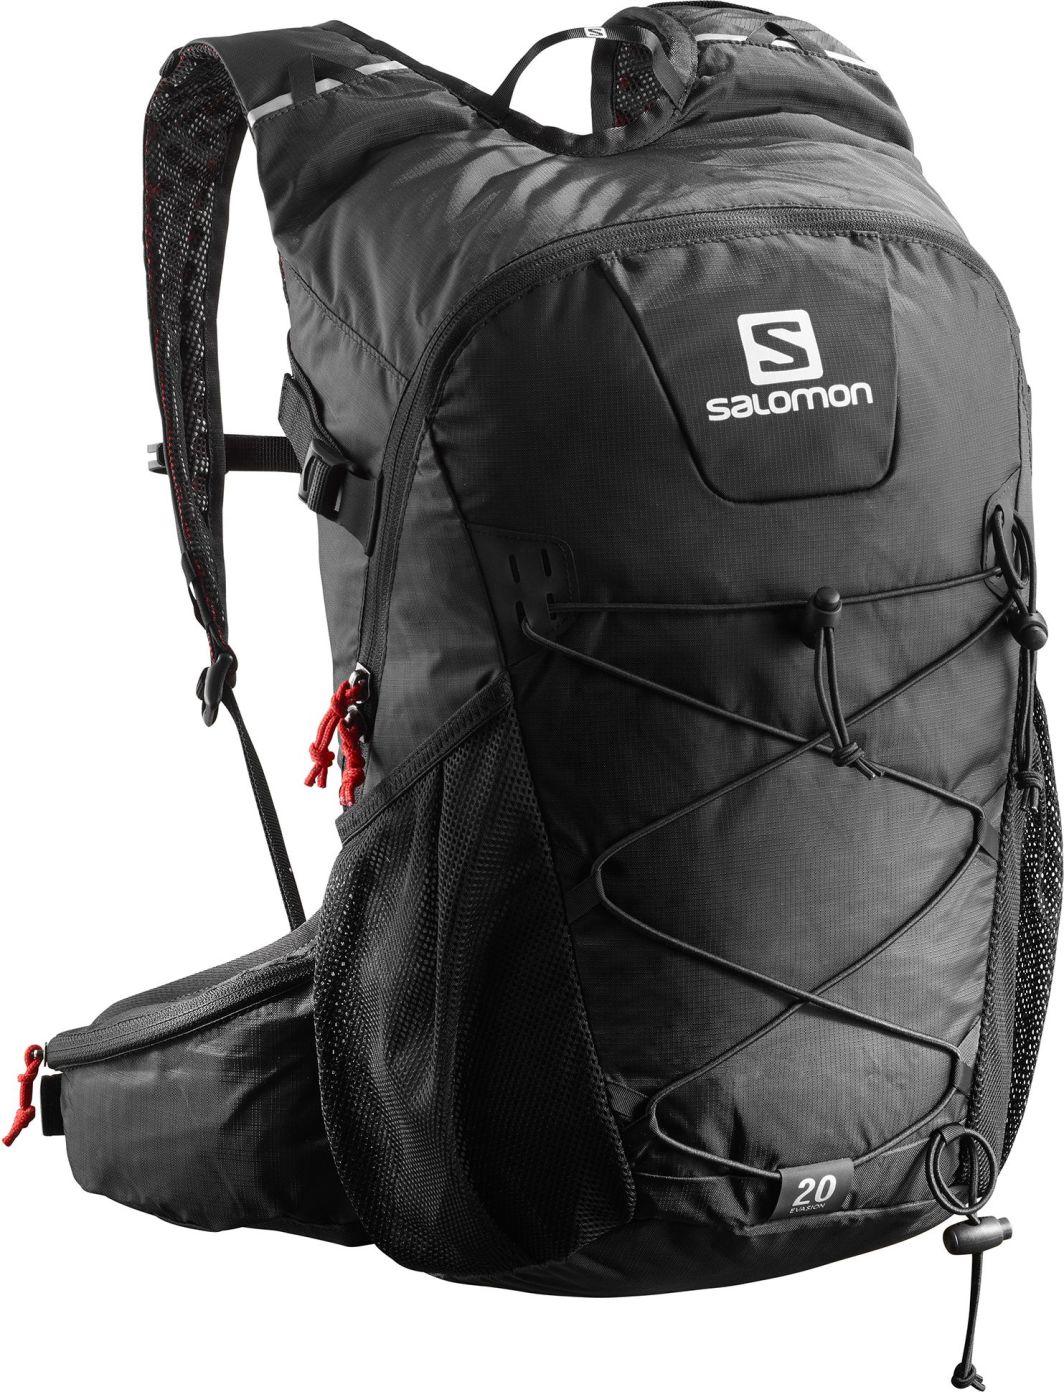 Salomon Plecak trekkingowy Evasion 20 Black (401641) ID produktu: 4691909